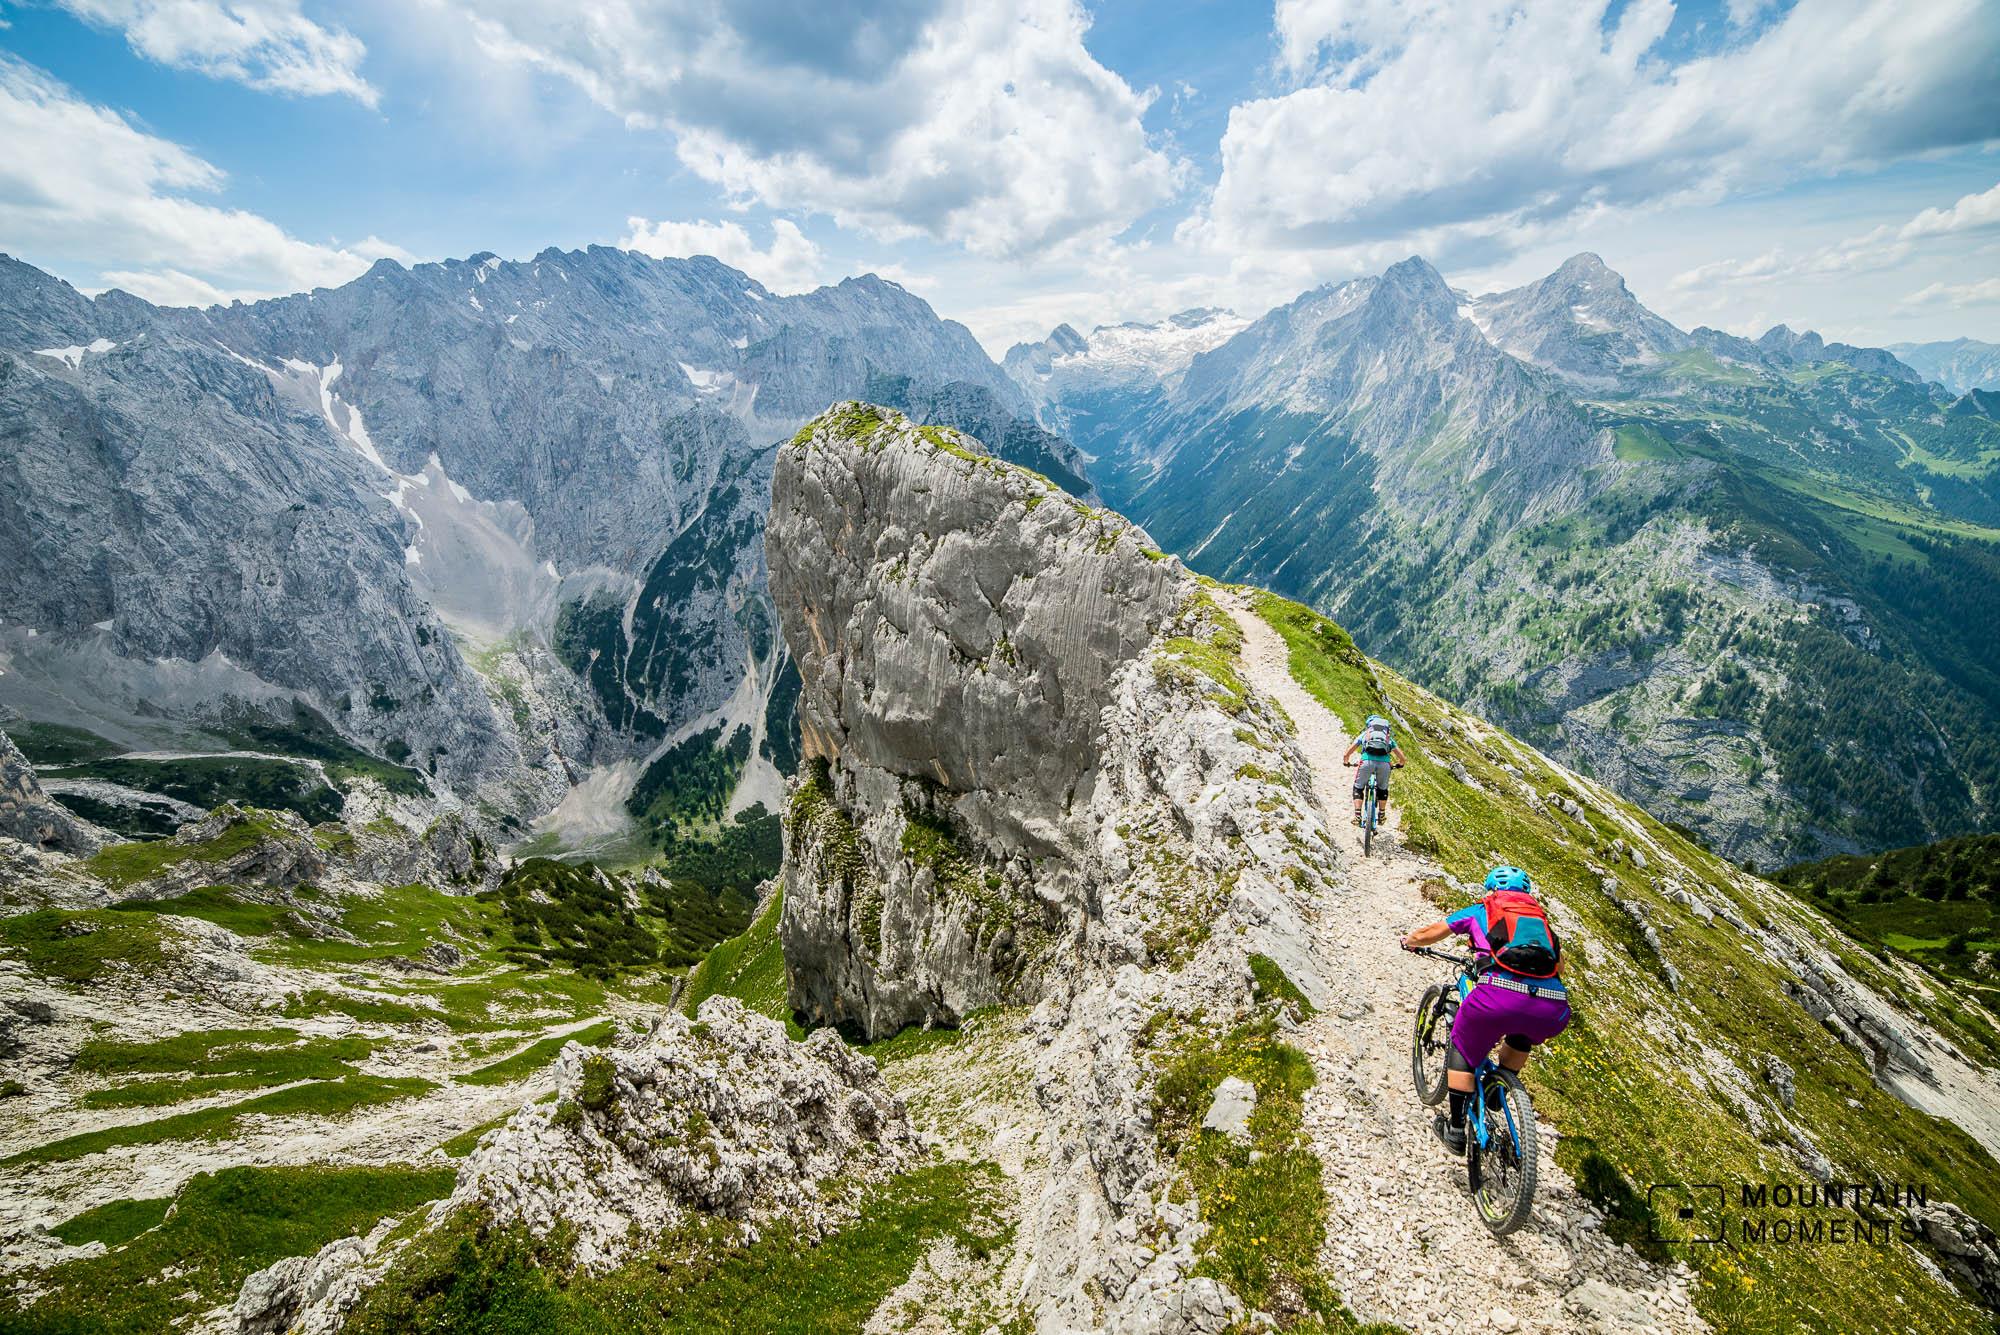 fotospot Zugspitze, fotoservice, bike fotoservice, mountainbike fotografie, epic shot mountainbike, mountainbike epic shot, singletrail epic shot, fotoservice singletrail